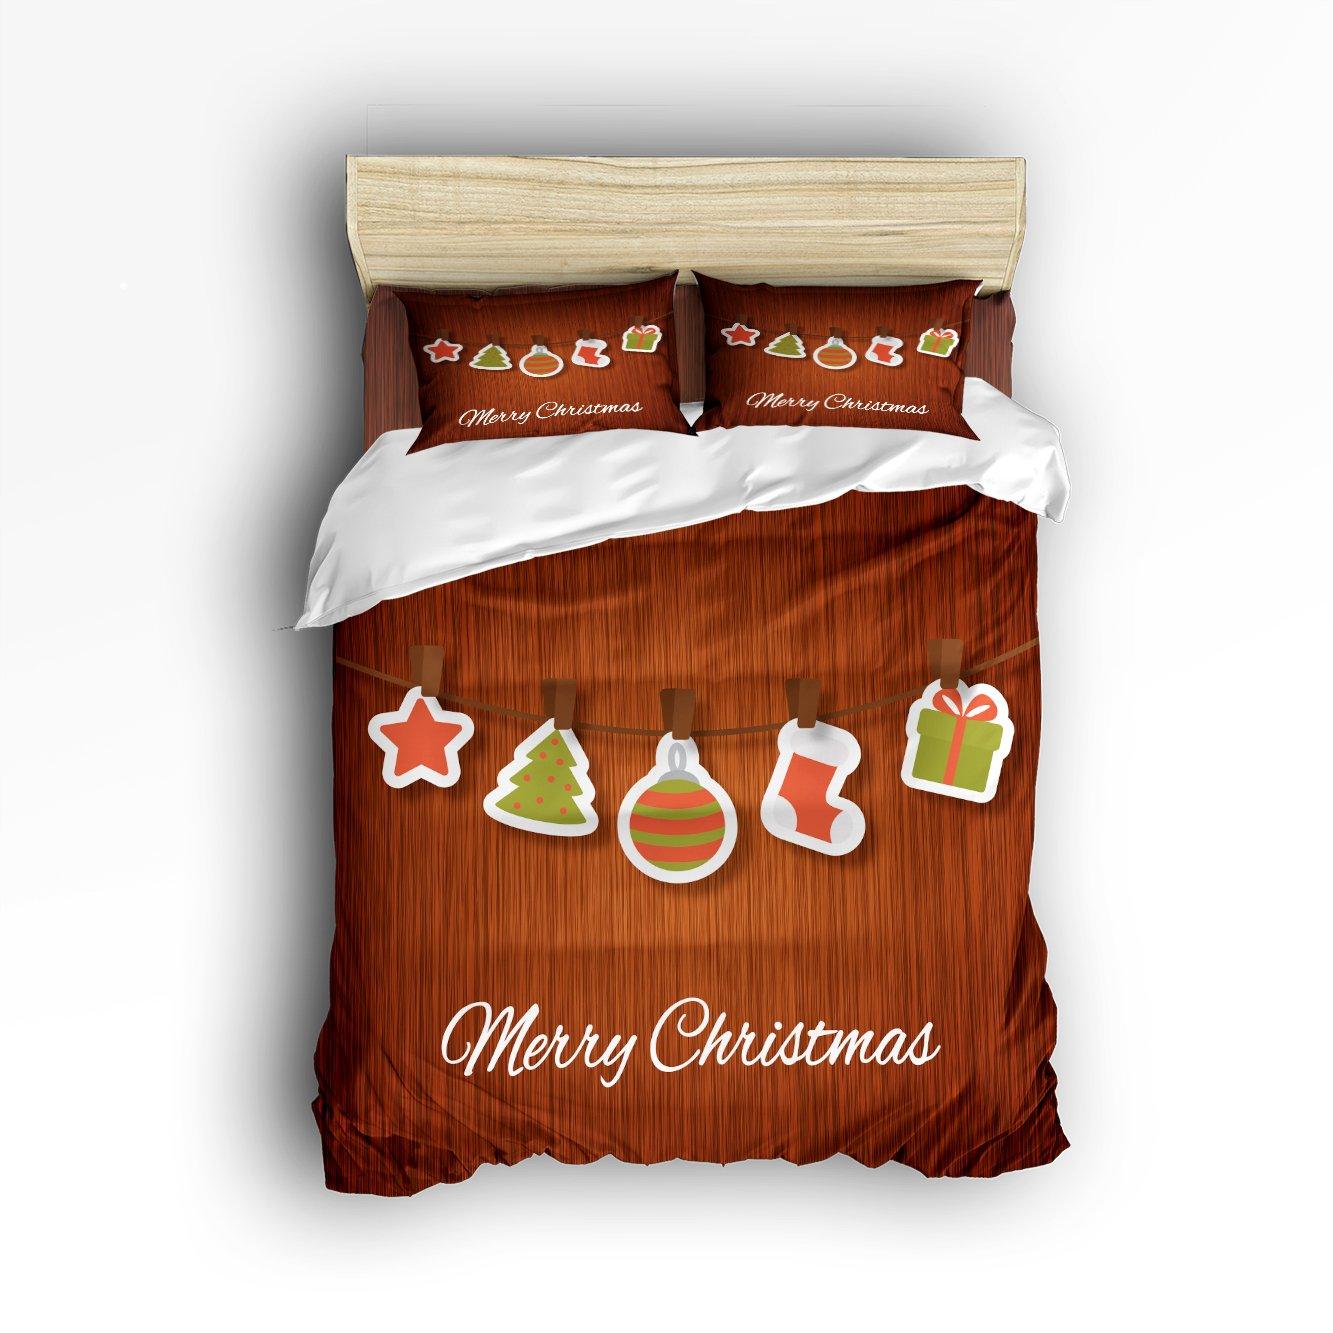 Christmas Gifts Star Socks Tree Pendant on Wood Decor Duvet Cover Set, Soft Microfiber Bedding with Zipper Closure by KAROLA